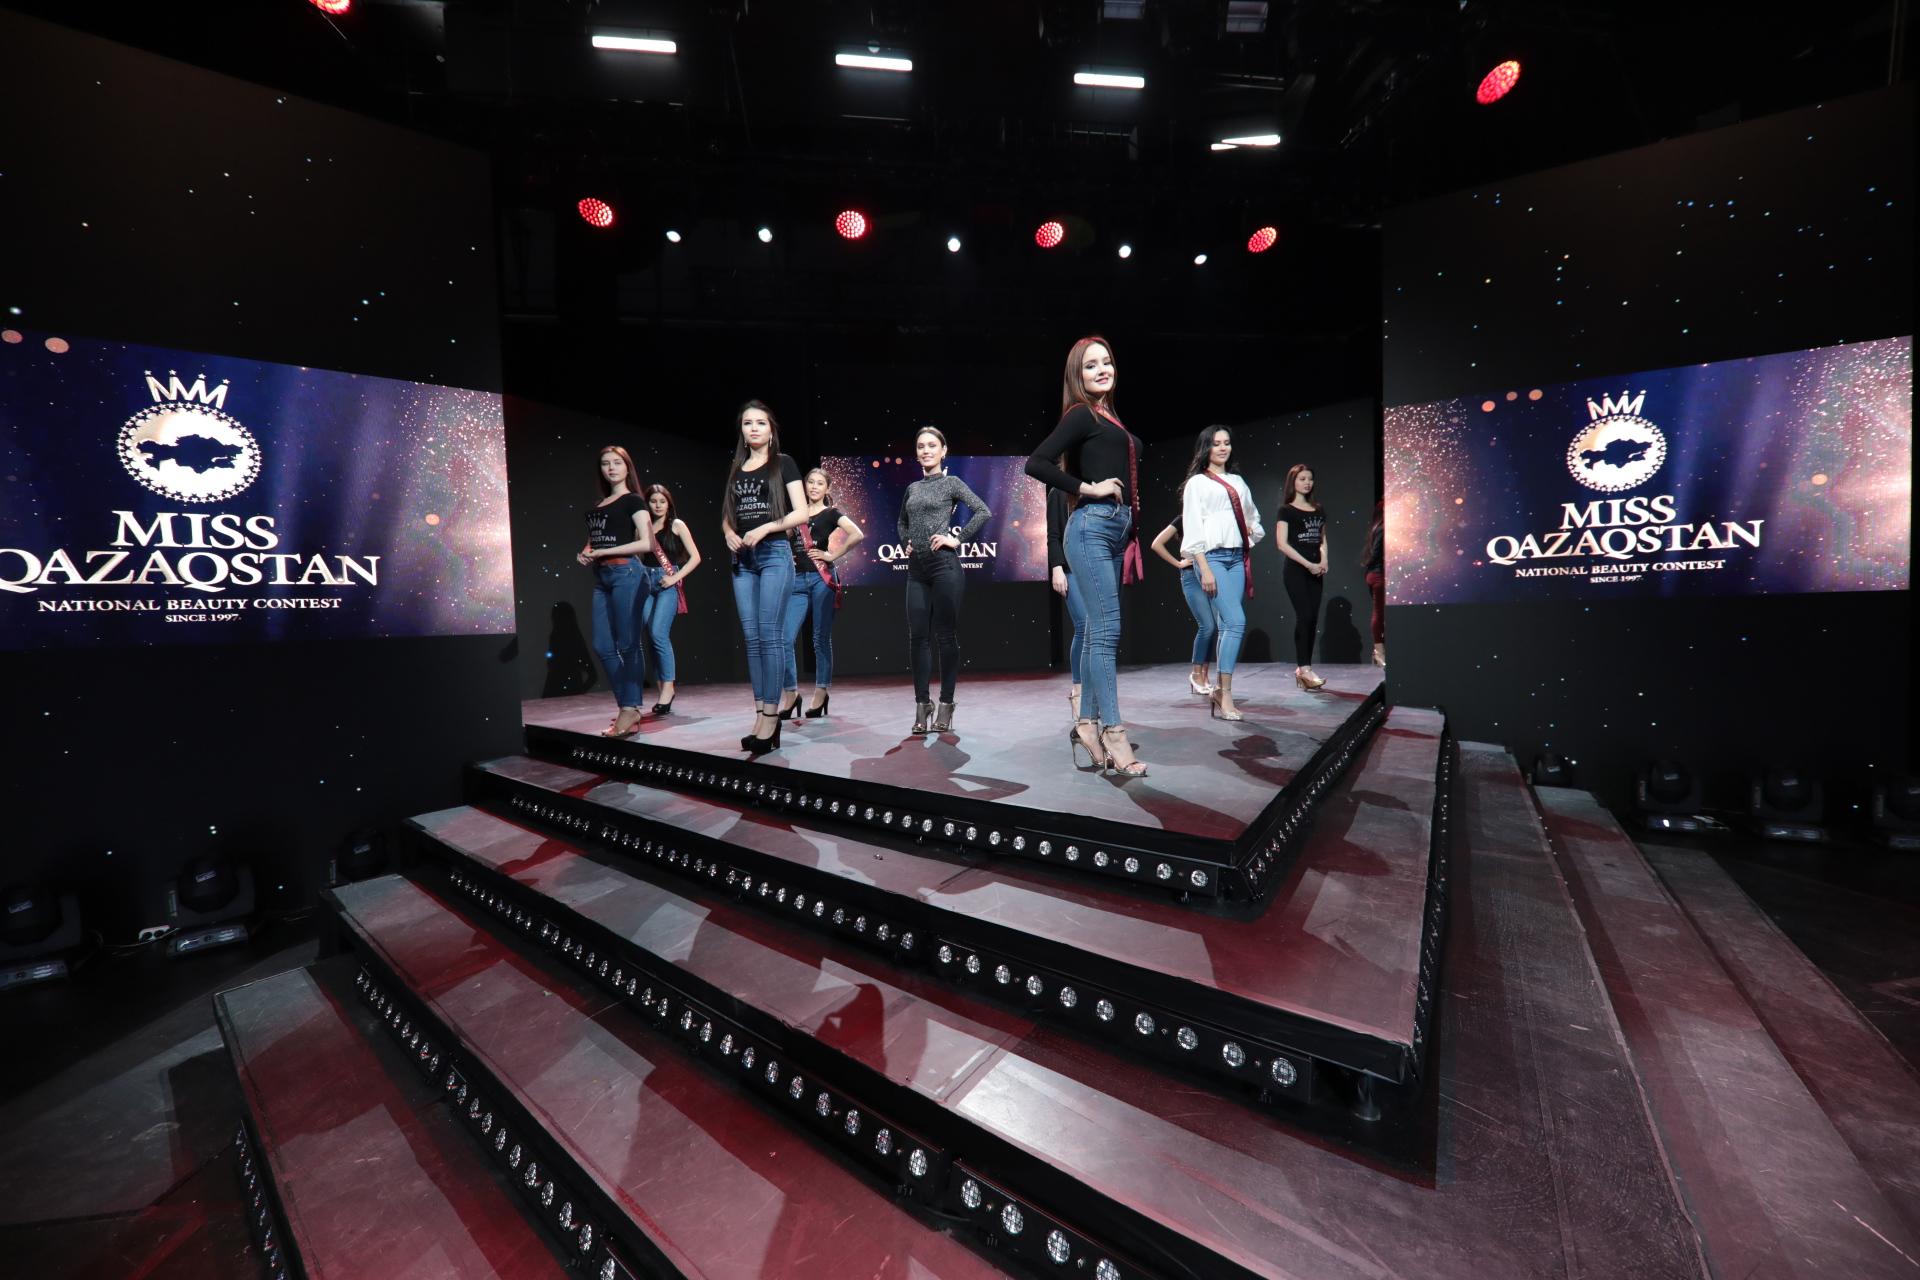 Мисс Казахстан 2019